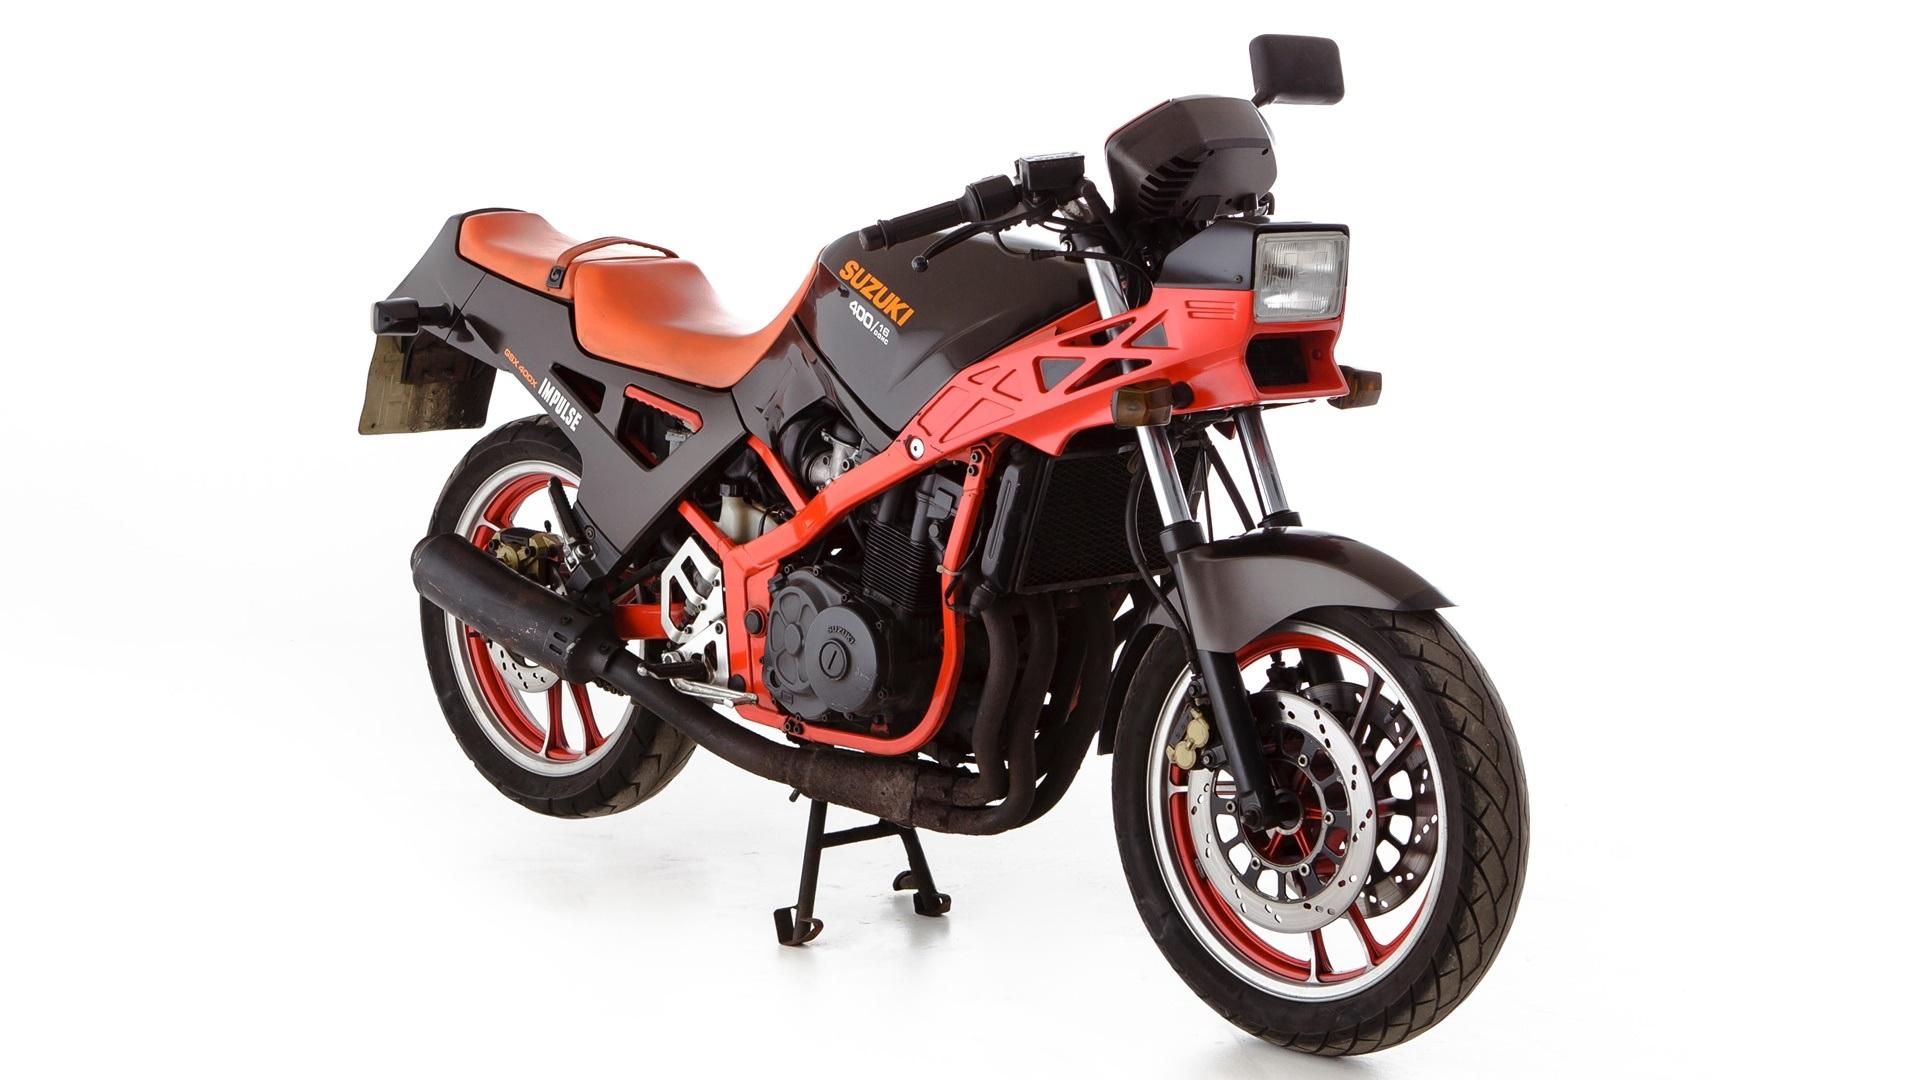 Moto del día: Suzuki GSX 400 X Impulse (GK71E)